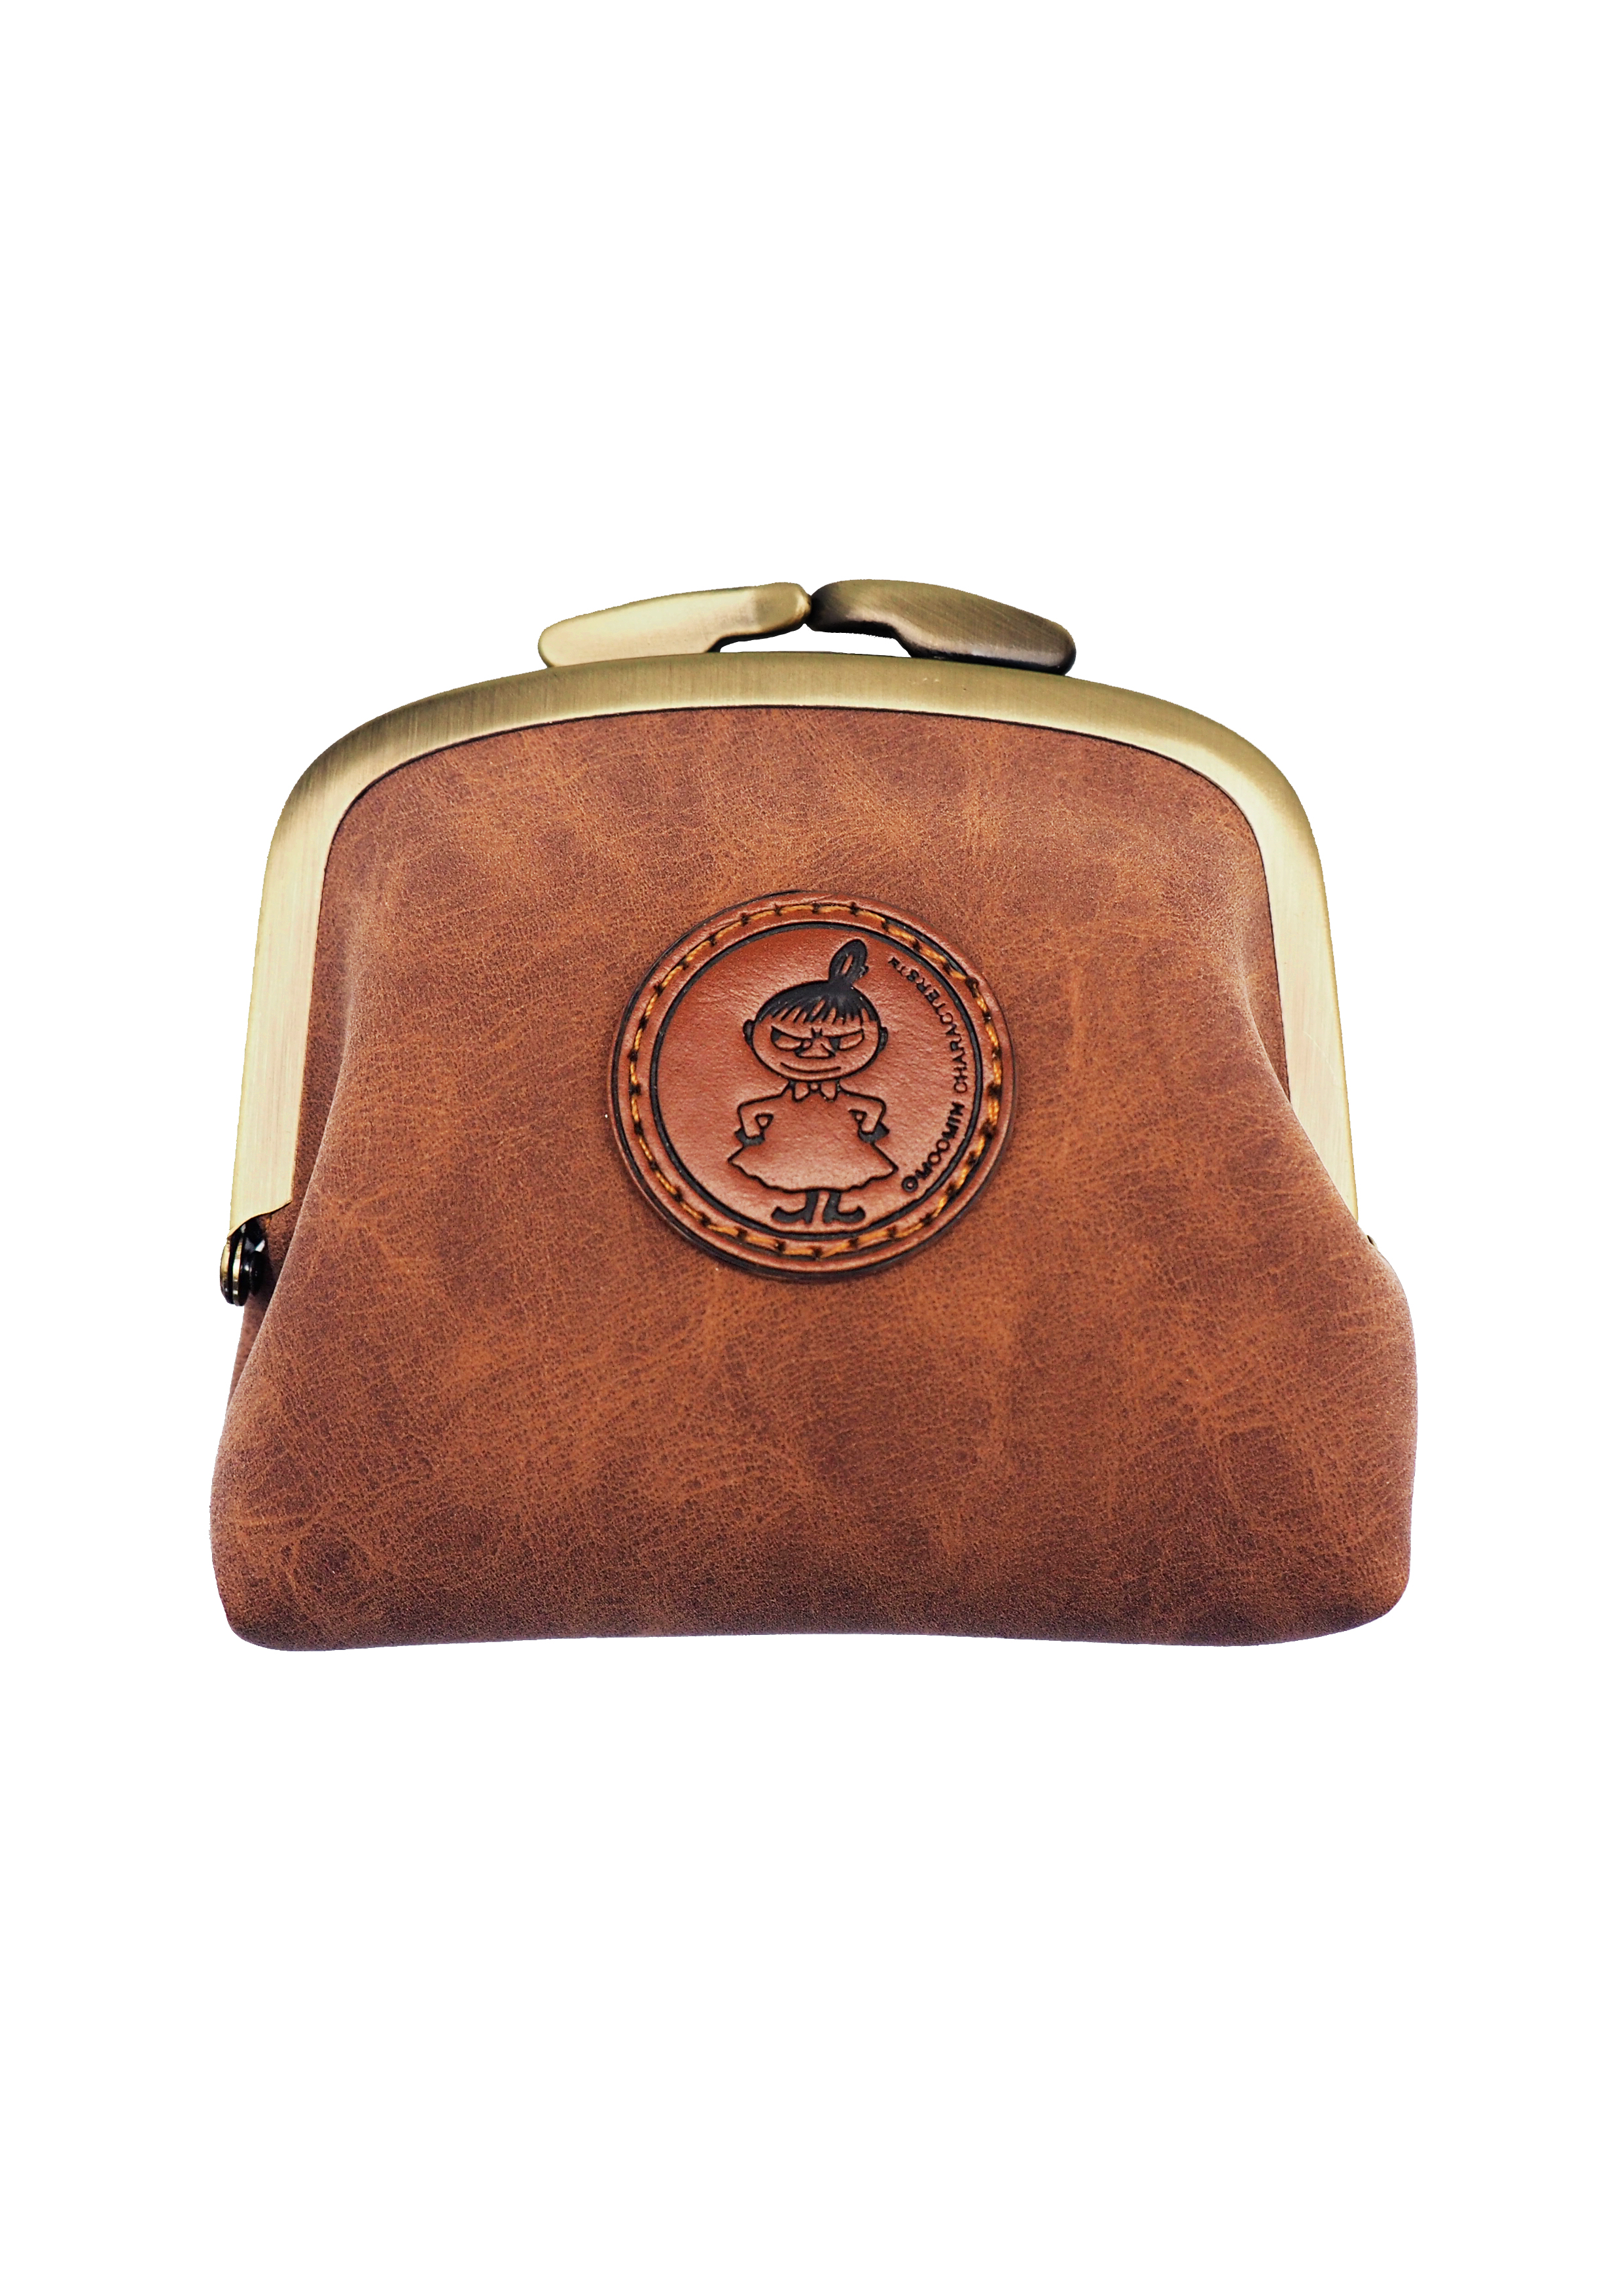 TMF Trade Little My coin purse